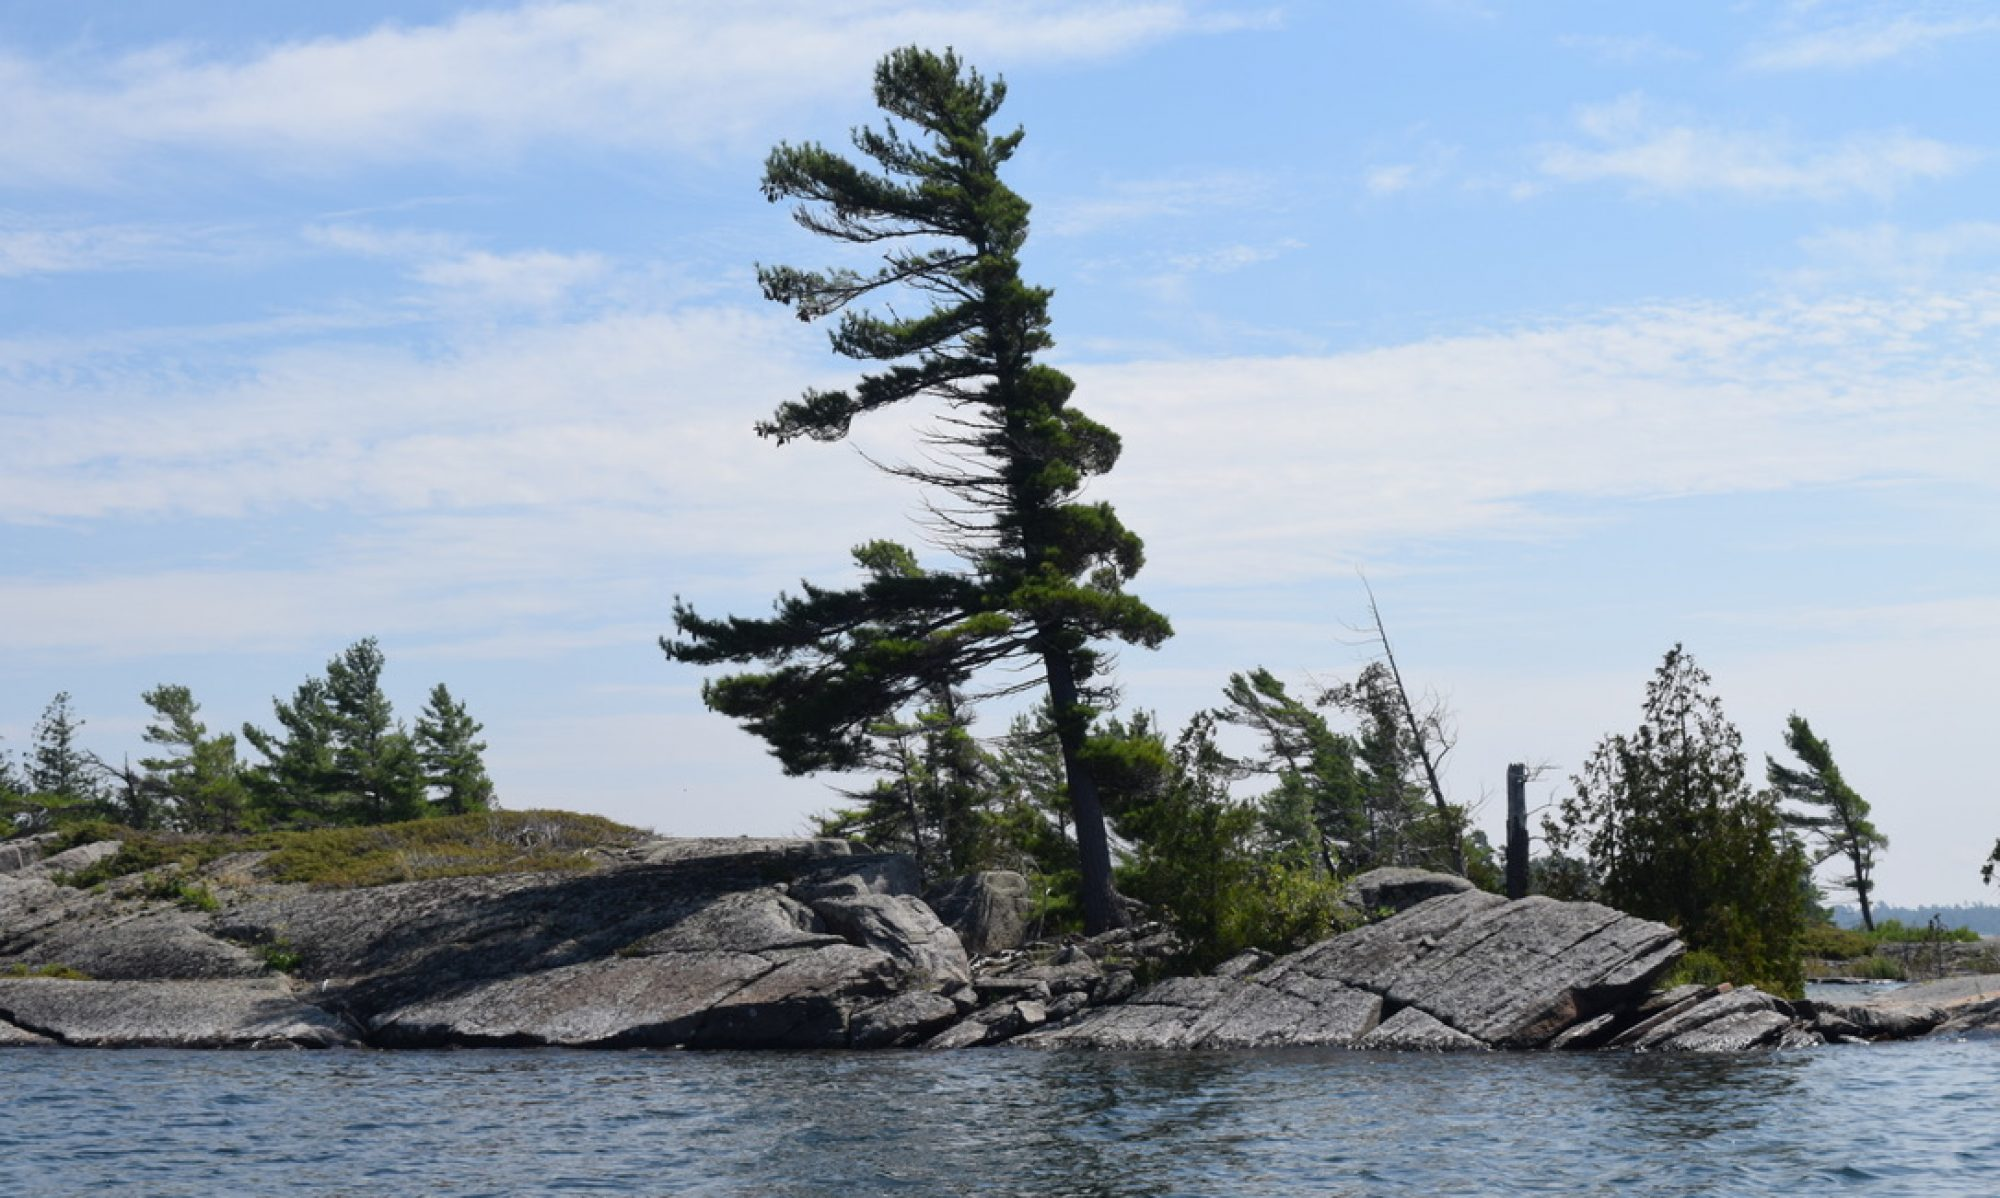 Wild Great Lakes